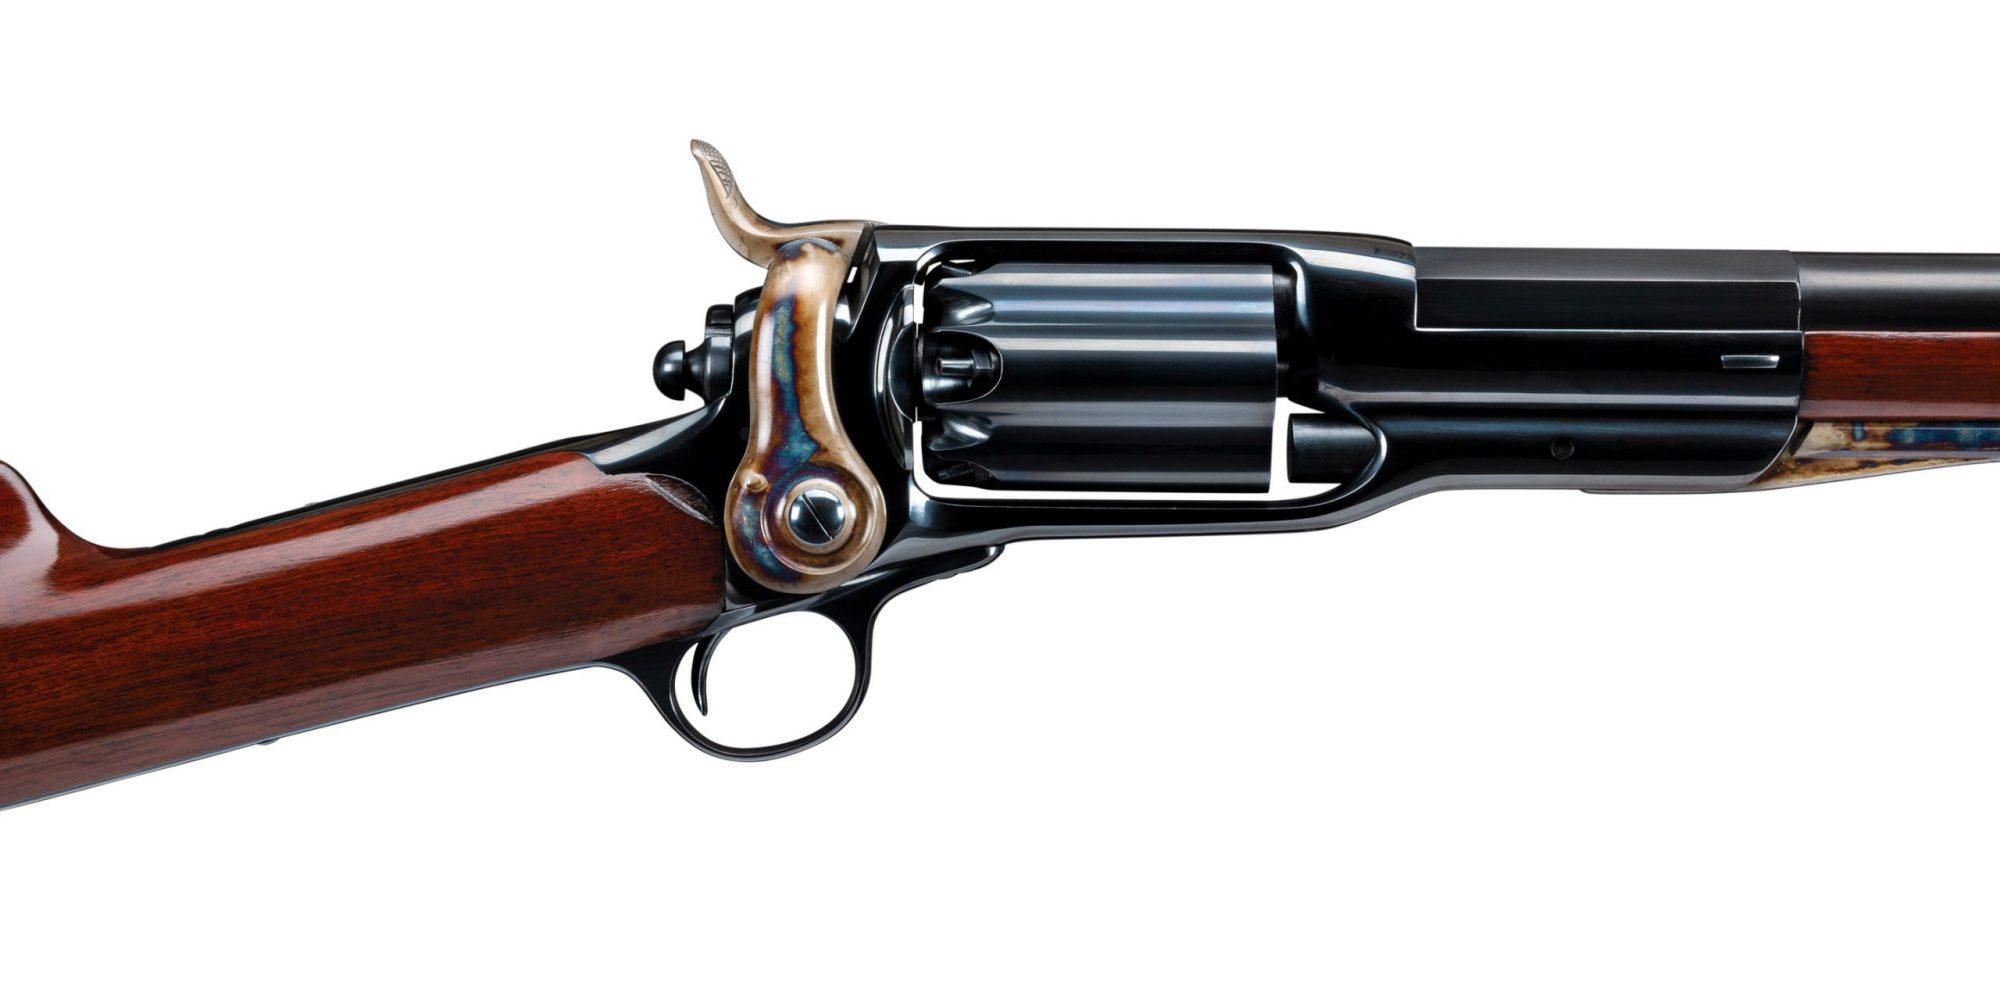 Photo of a rare Colt Model 1855 revolving 20 gauge shotgun after restoration by Turnbull Restoration of Bloomfield, NY